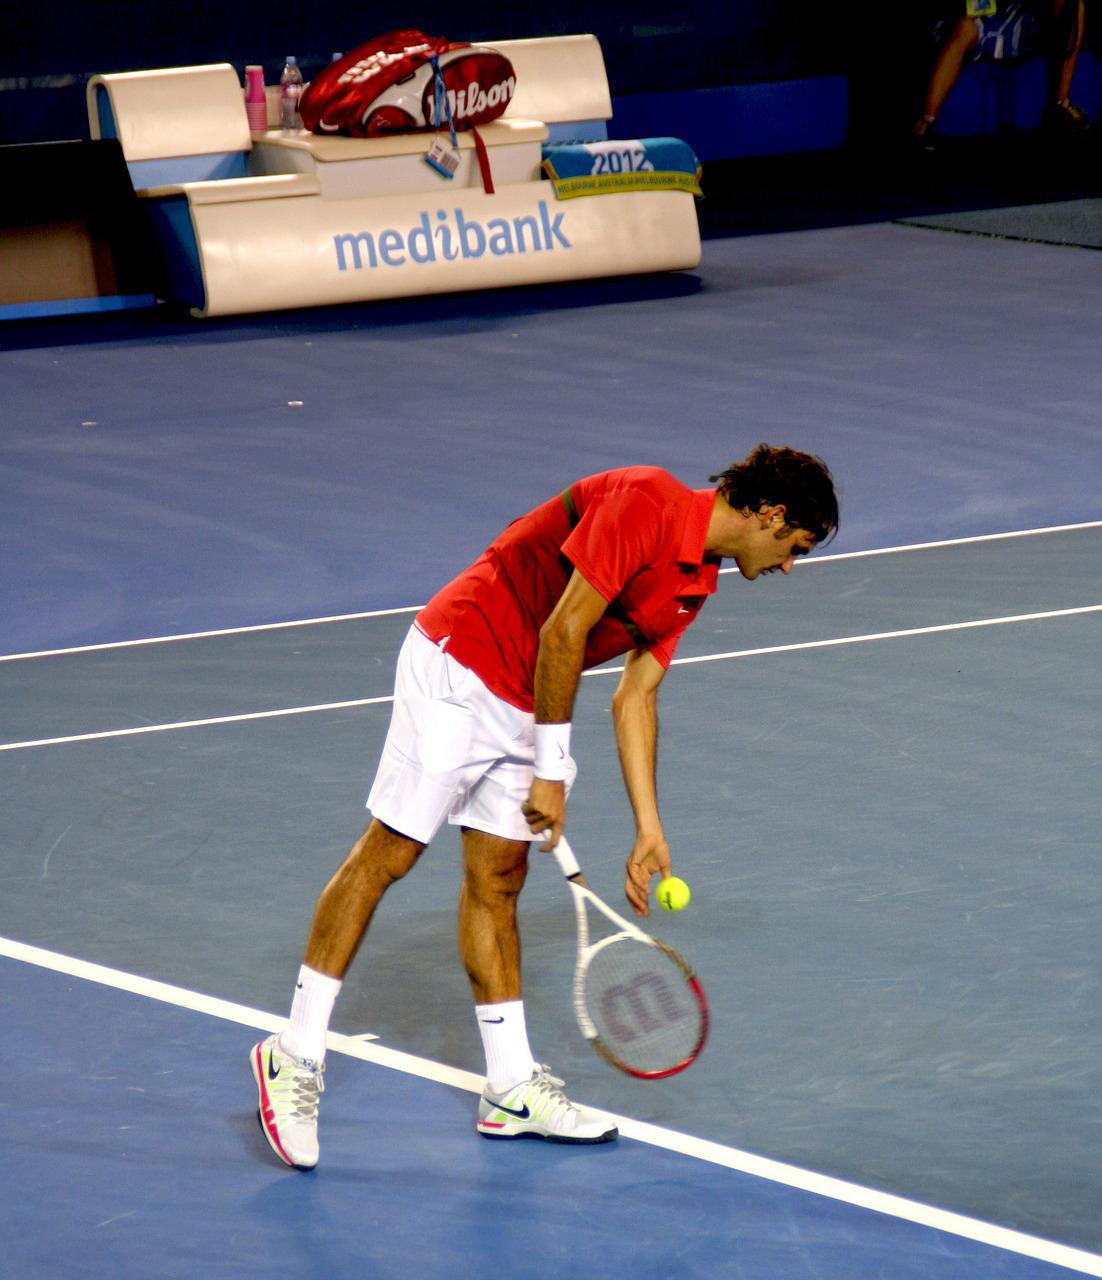 Roger フェデラー テニス Tennispieler Pixabayの無料写真